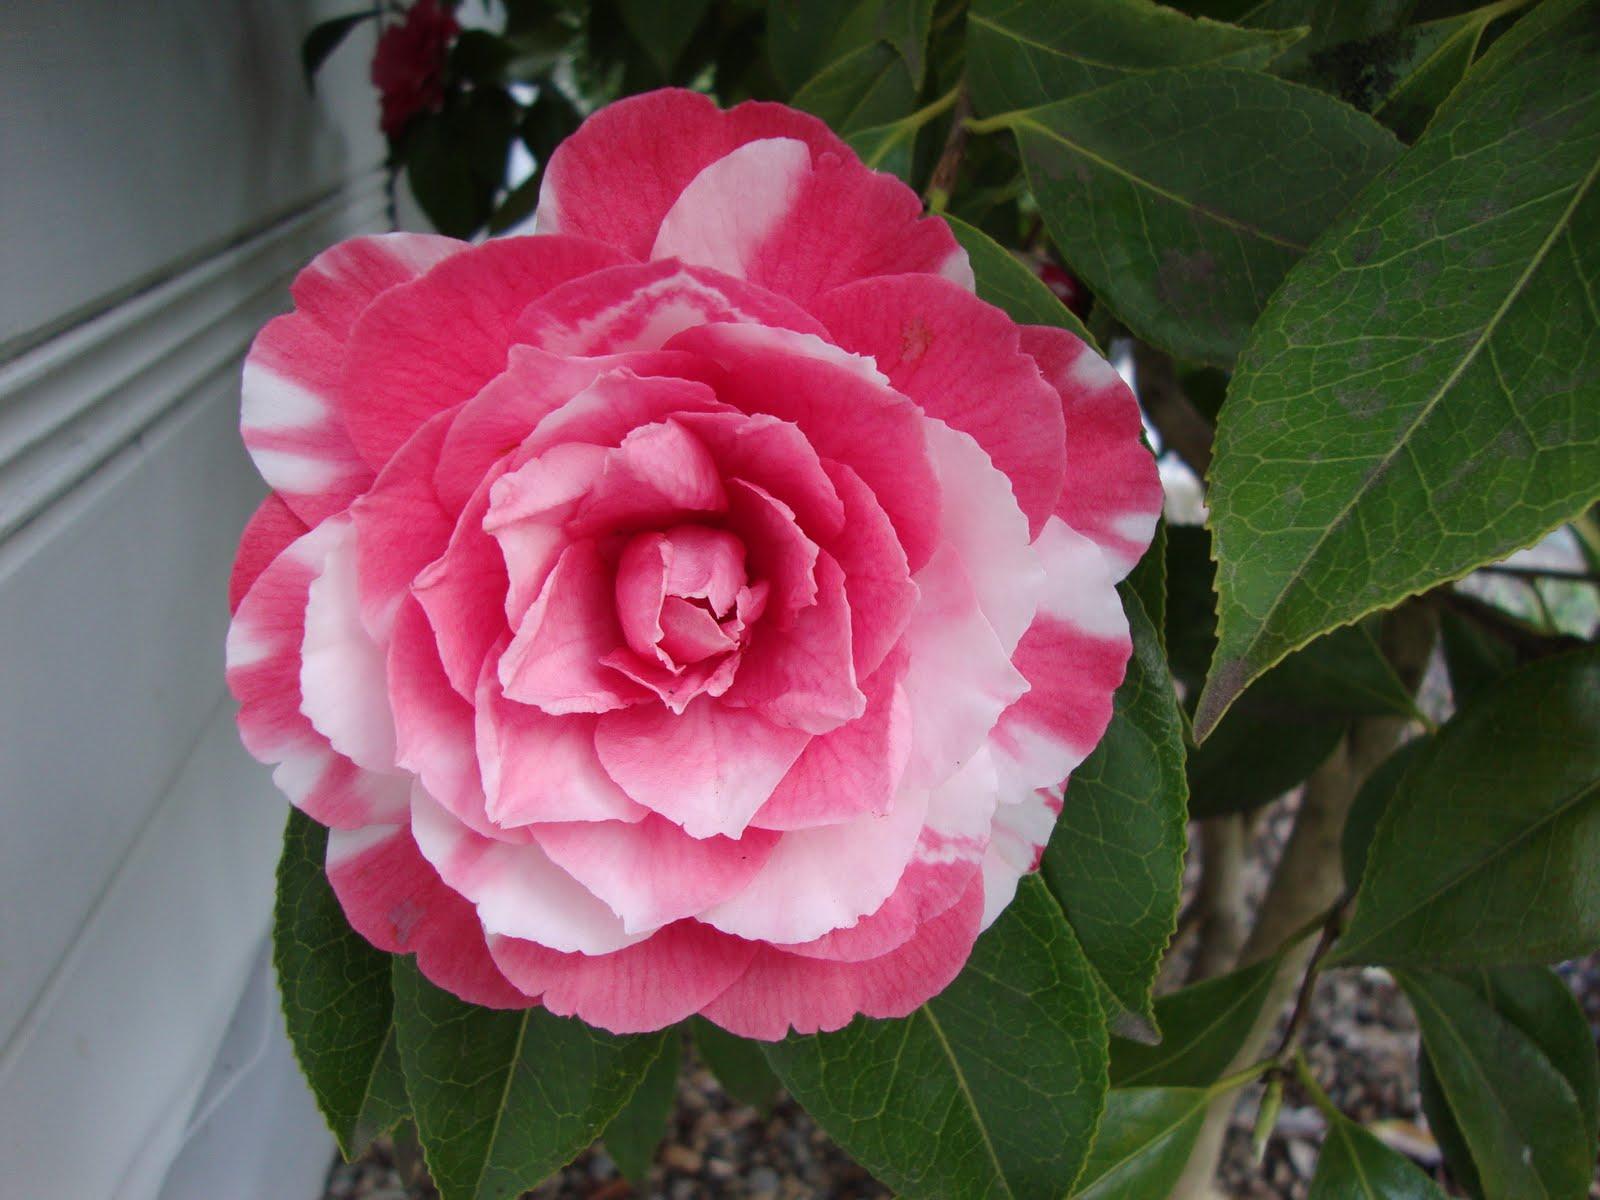 Camellia%2Bbloom%2B2 Camellia As Houseplant on